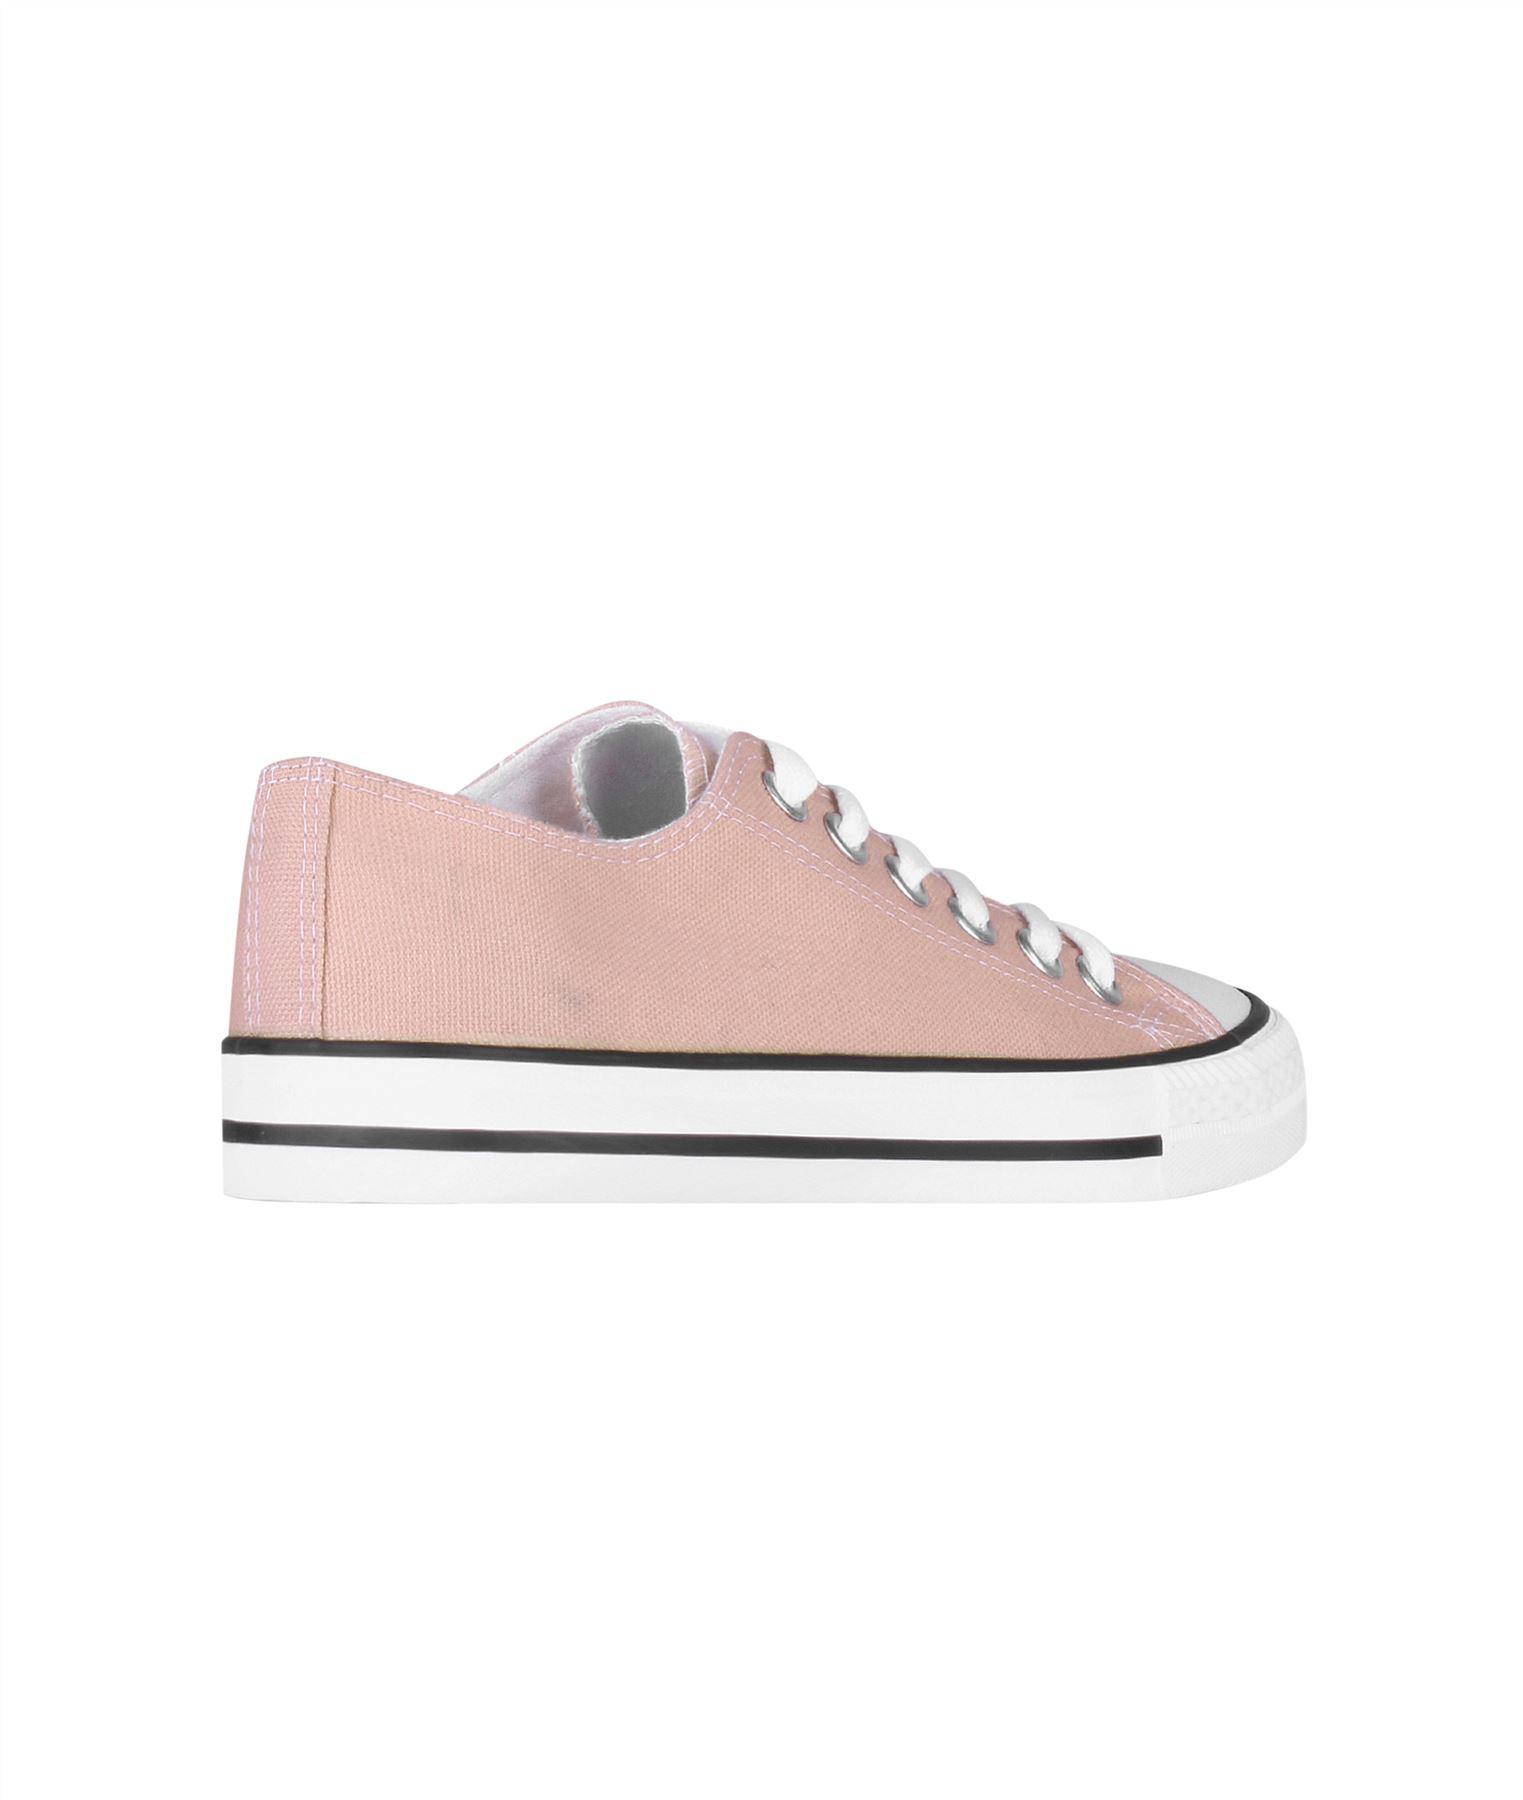 Zapatillas-Mujer-Casuales-Deportiva-Barata-Lona-Moda-Originales-Outlet-Tela-Moda miniatura 44